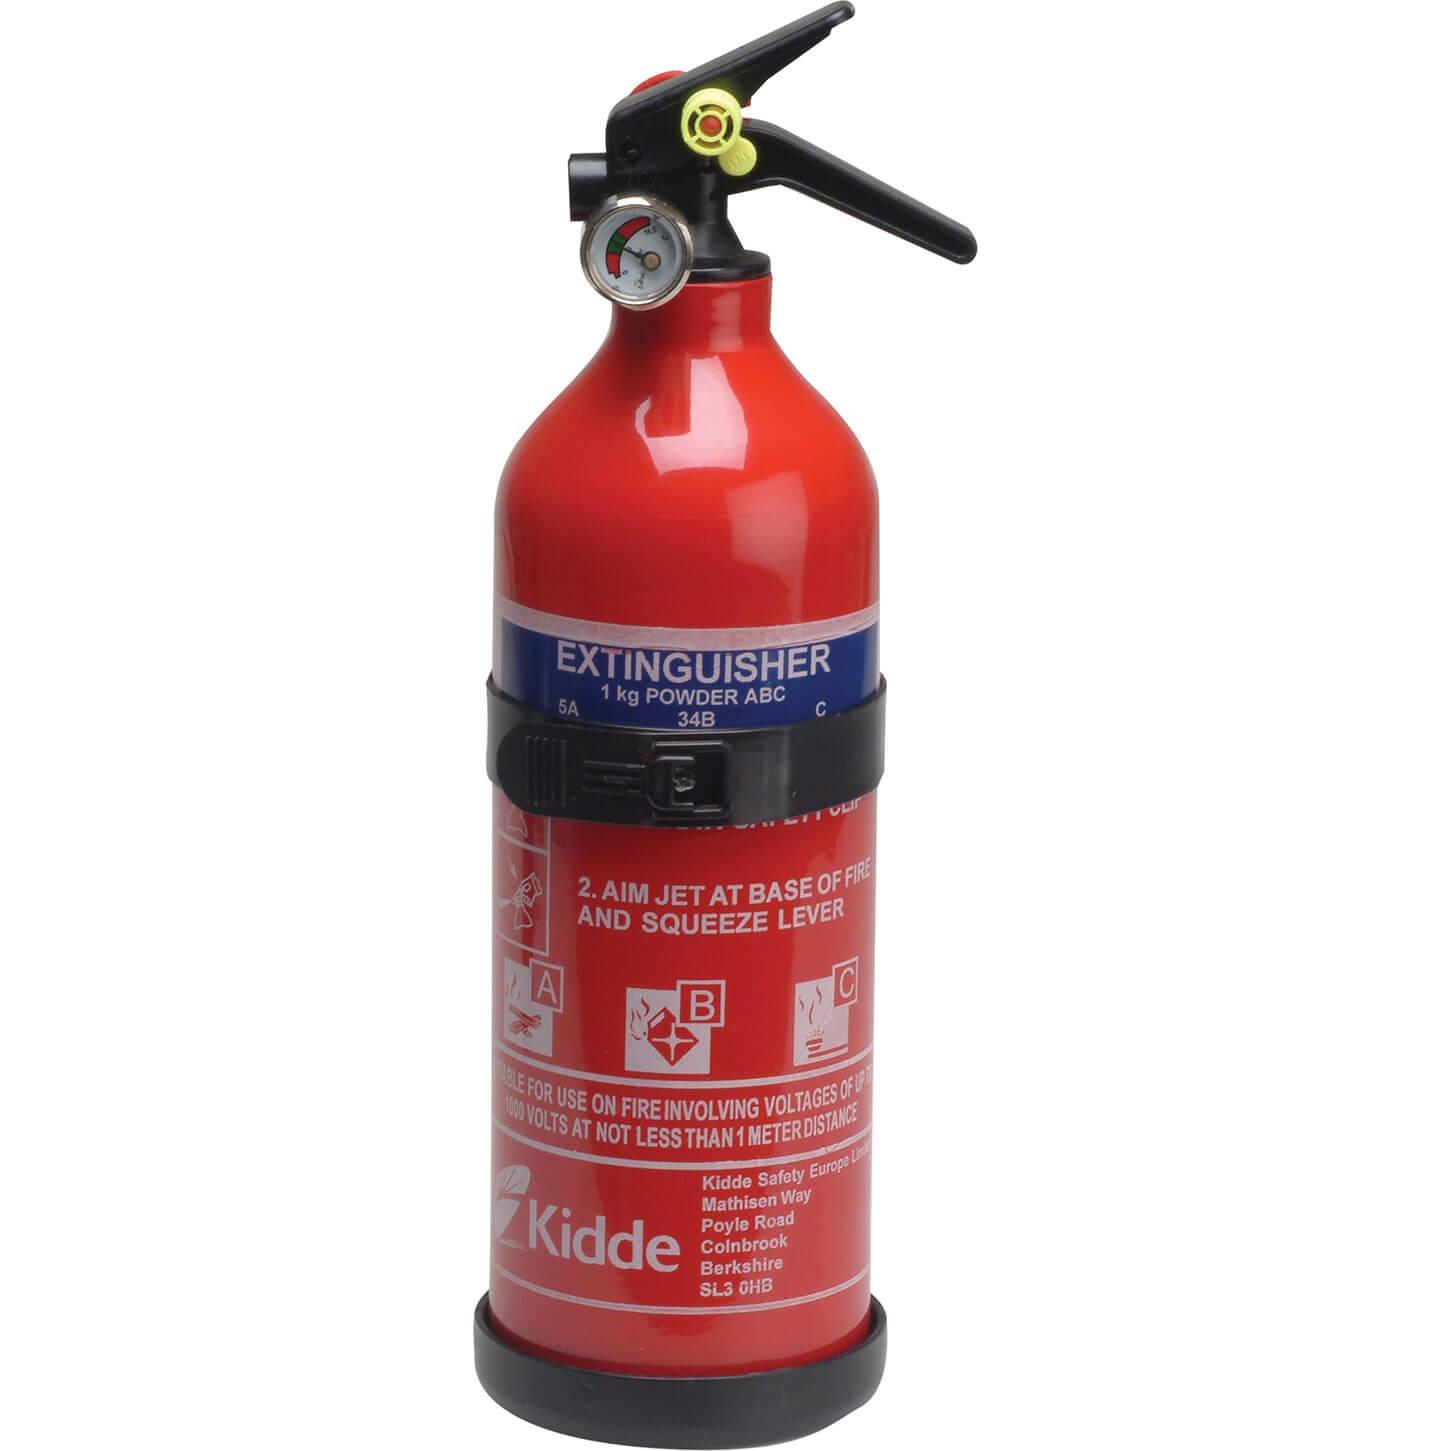 Kidde Multi Purpose ABC Fire Extinguisher